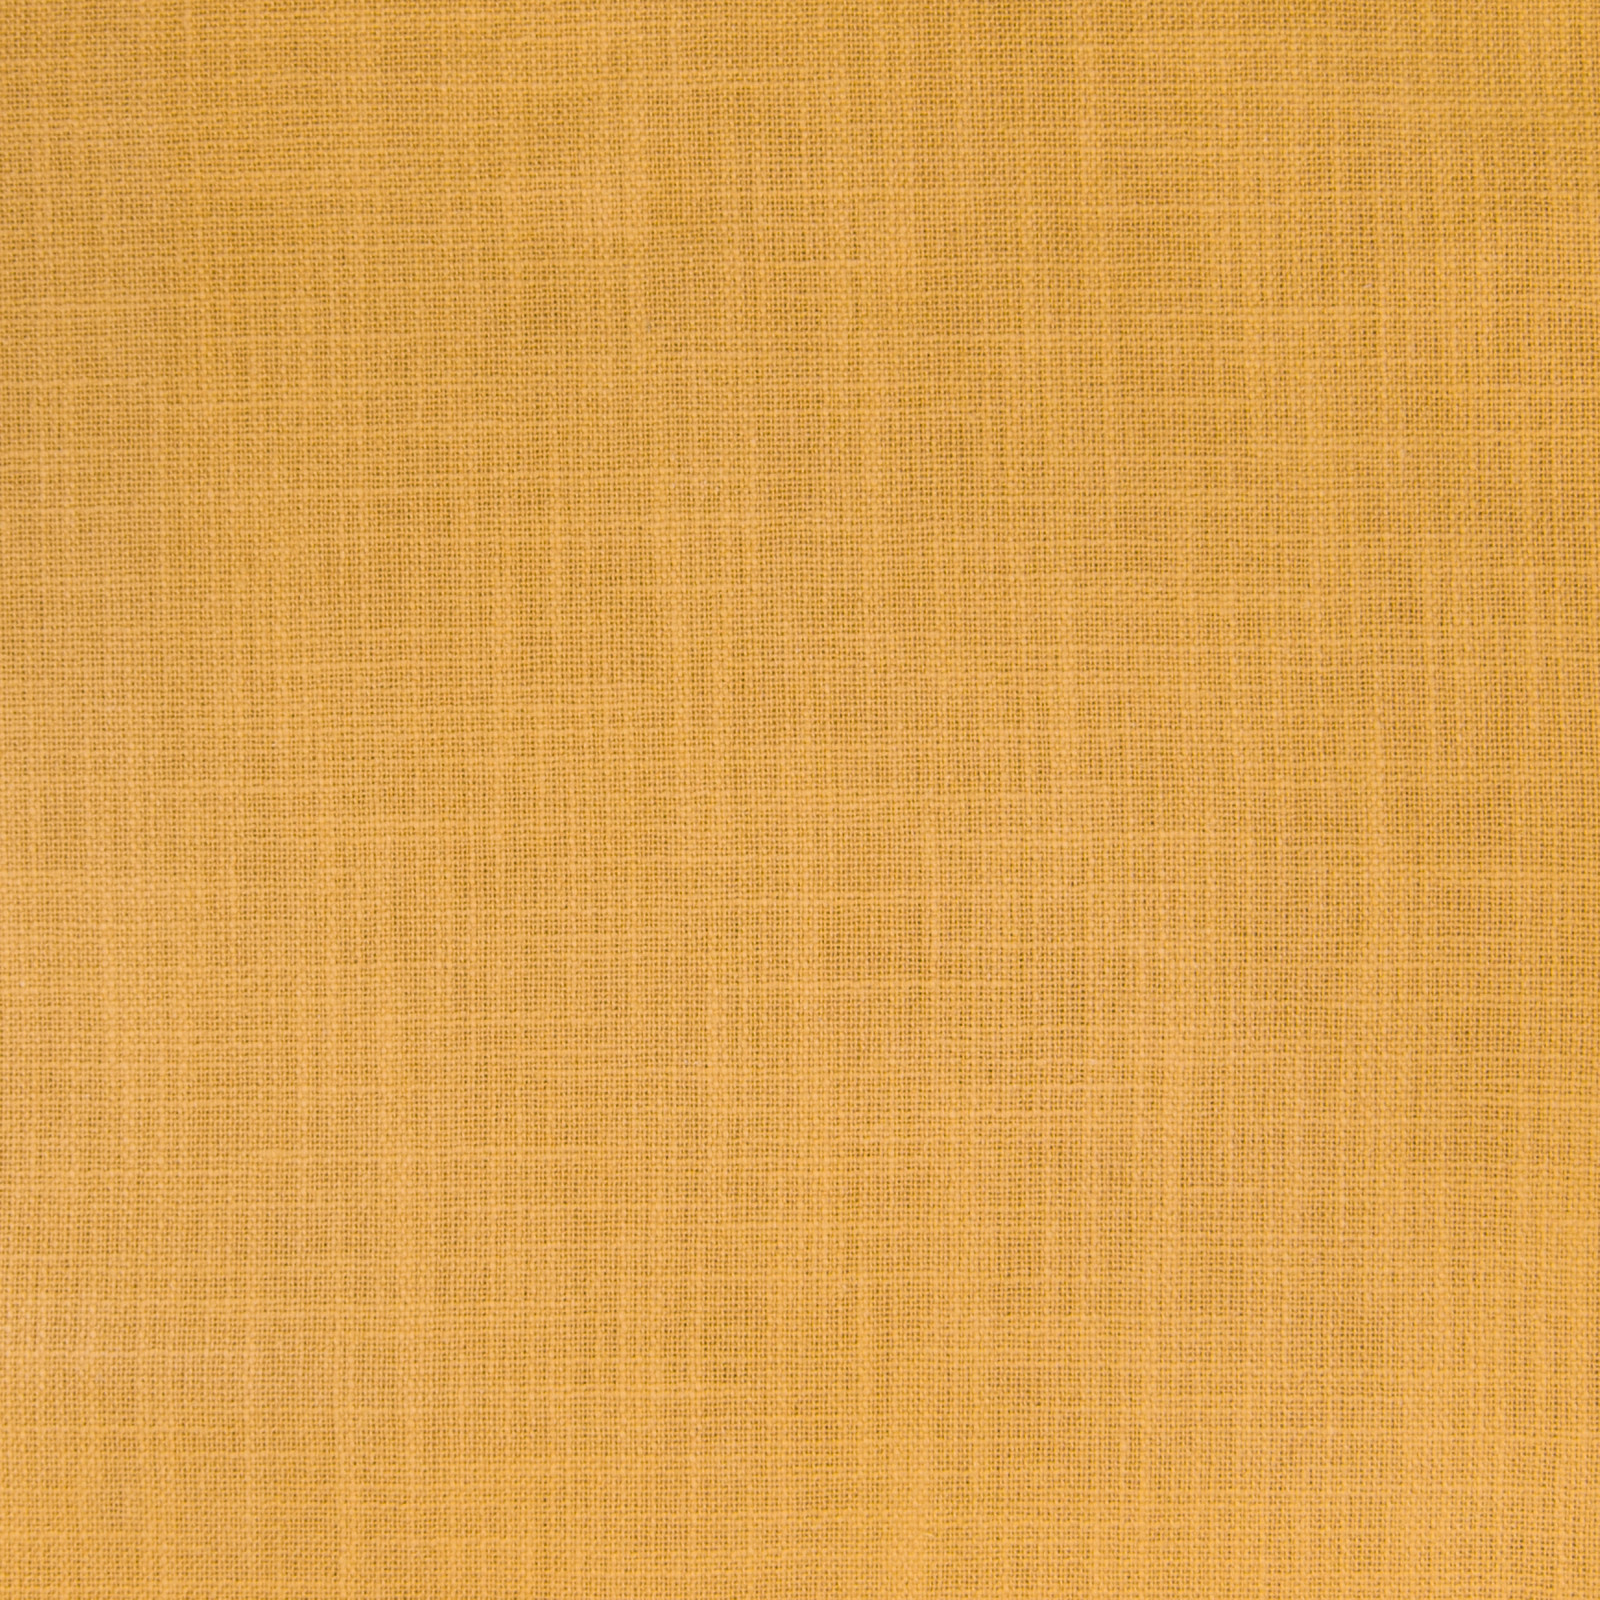 B3574 Marigold Greenhouse Fabrics